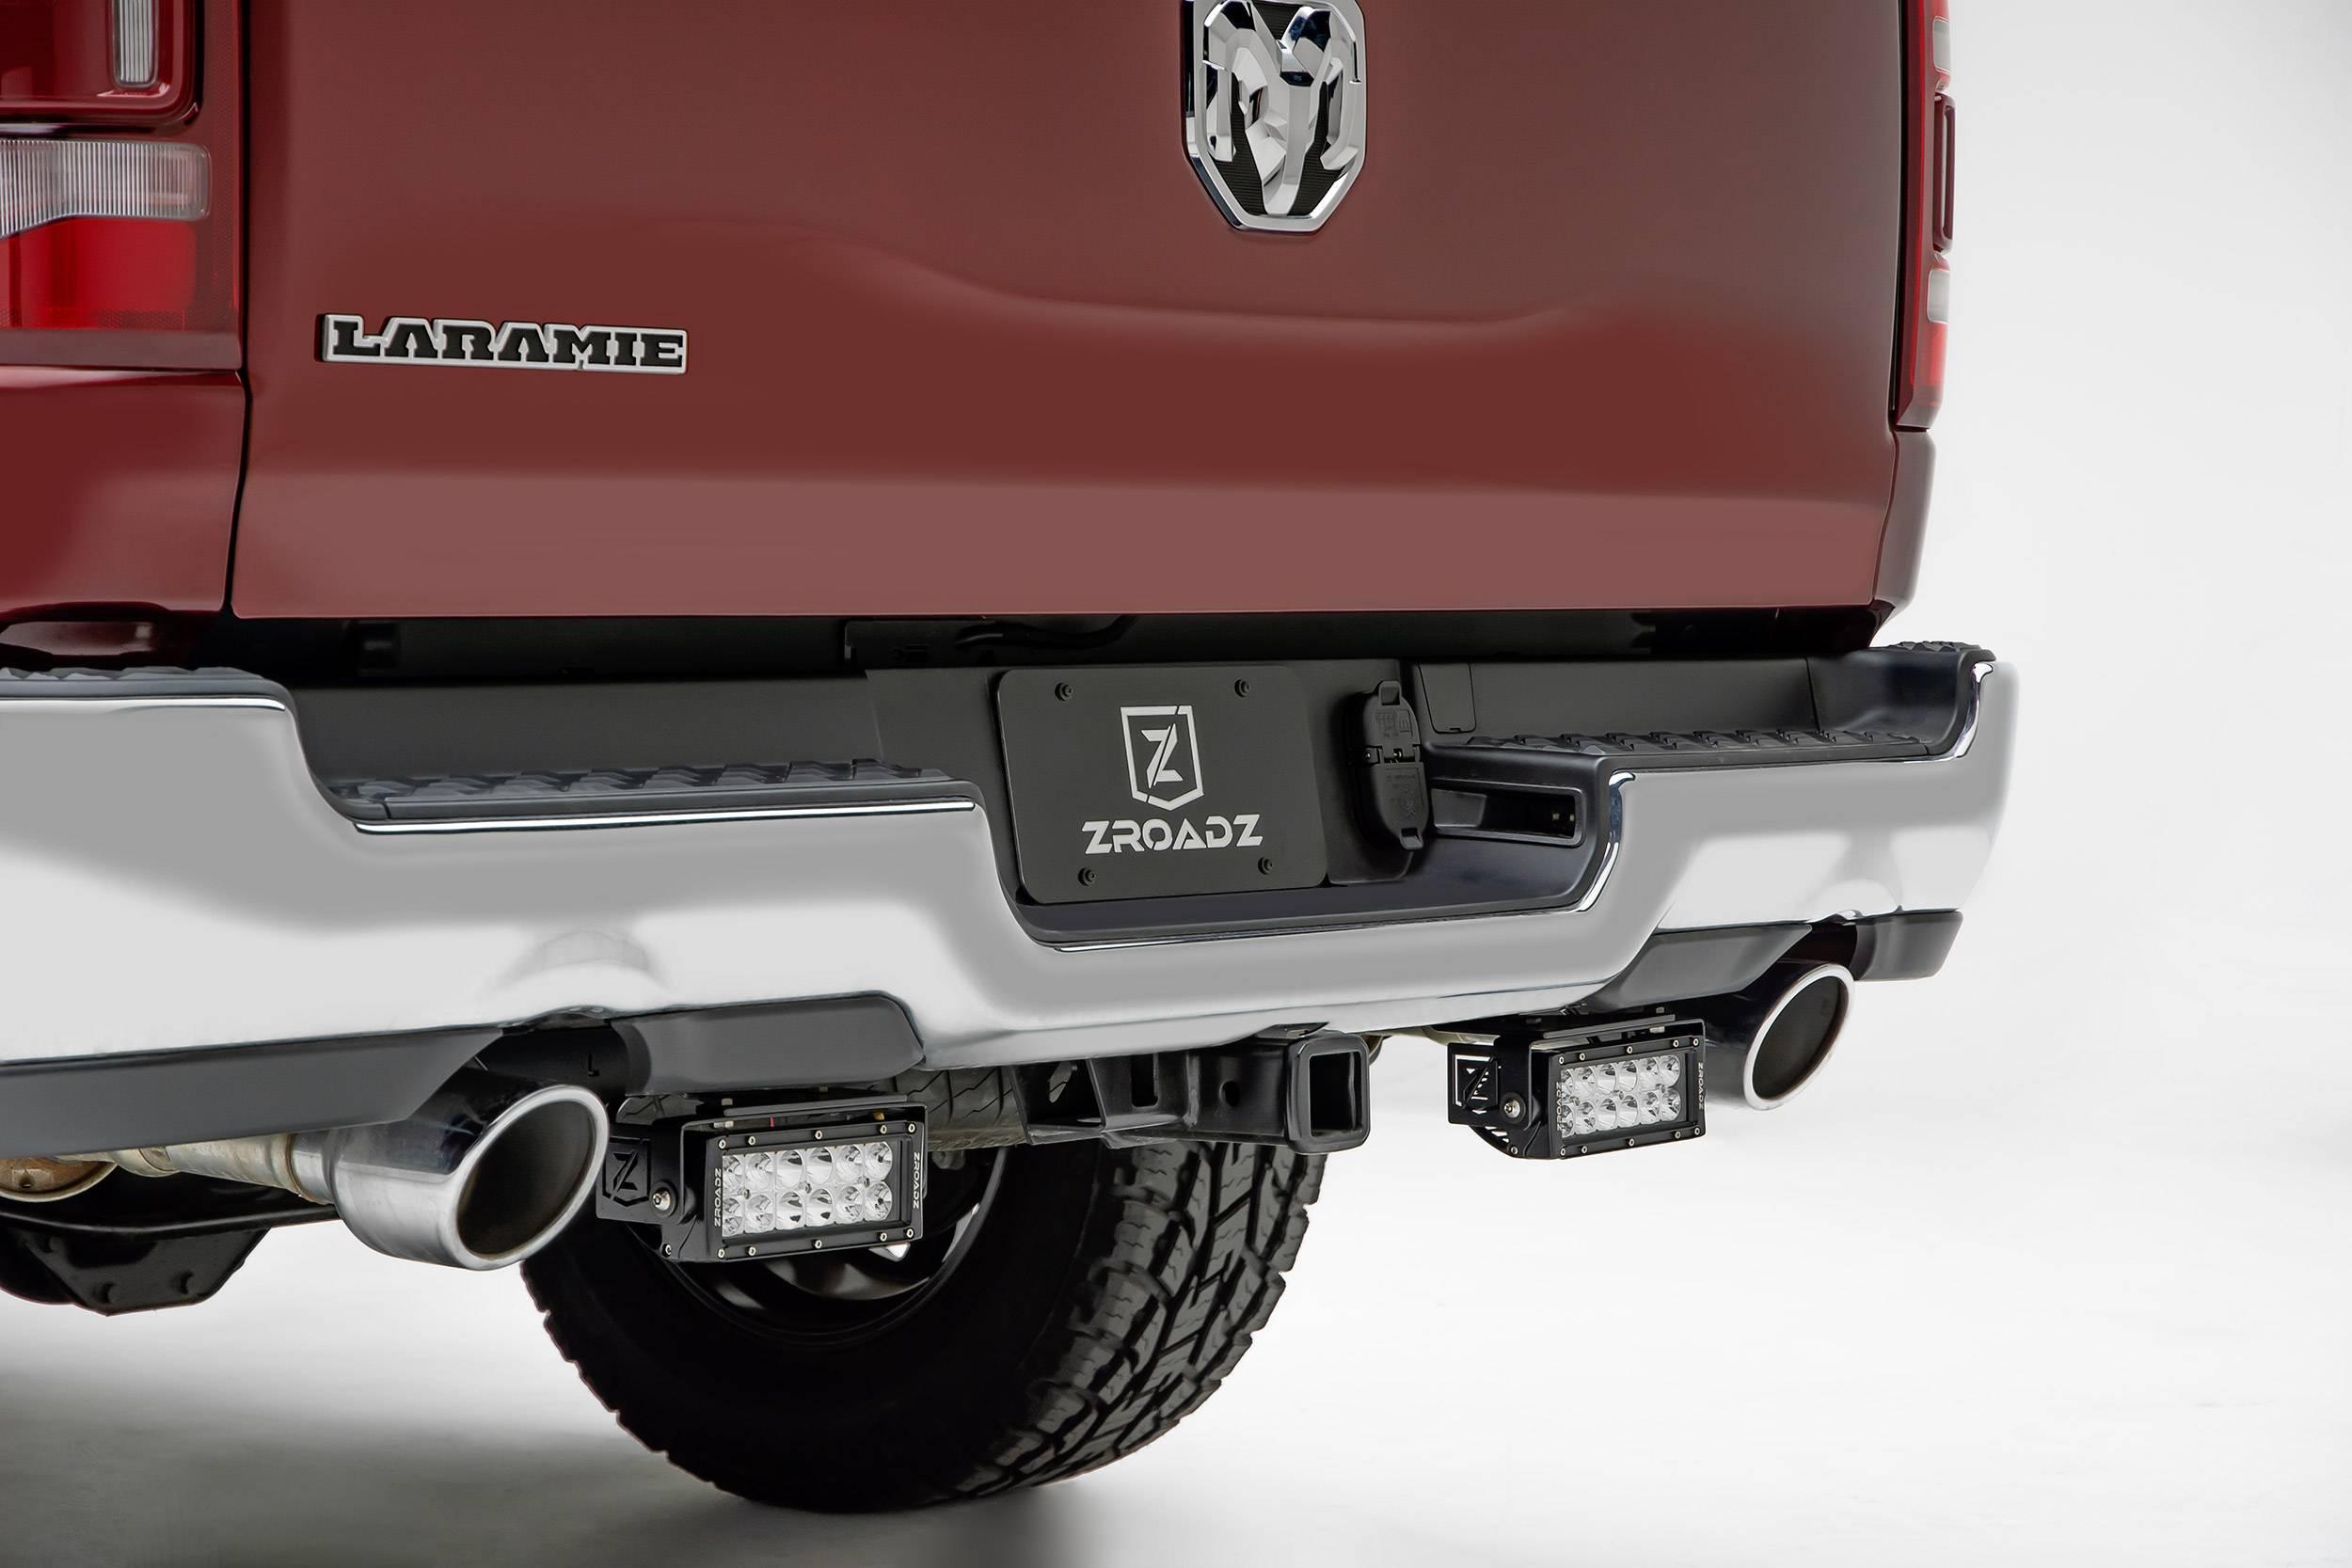 Ram 1500 Bumper >> 2019 Ram 1500 Rear Bumper Led Bracket To Mount 2 6 Inch Straight Light Bar Pn Z384721